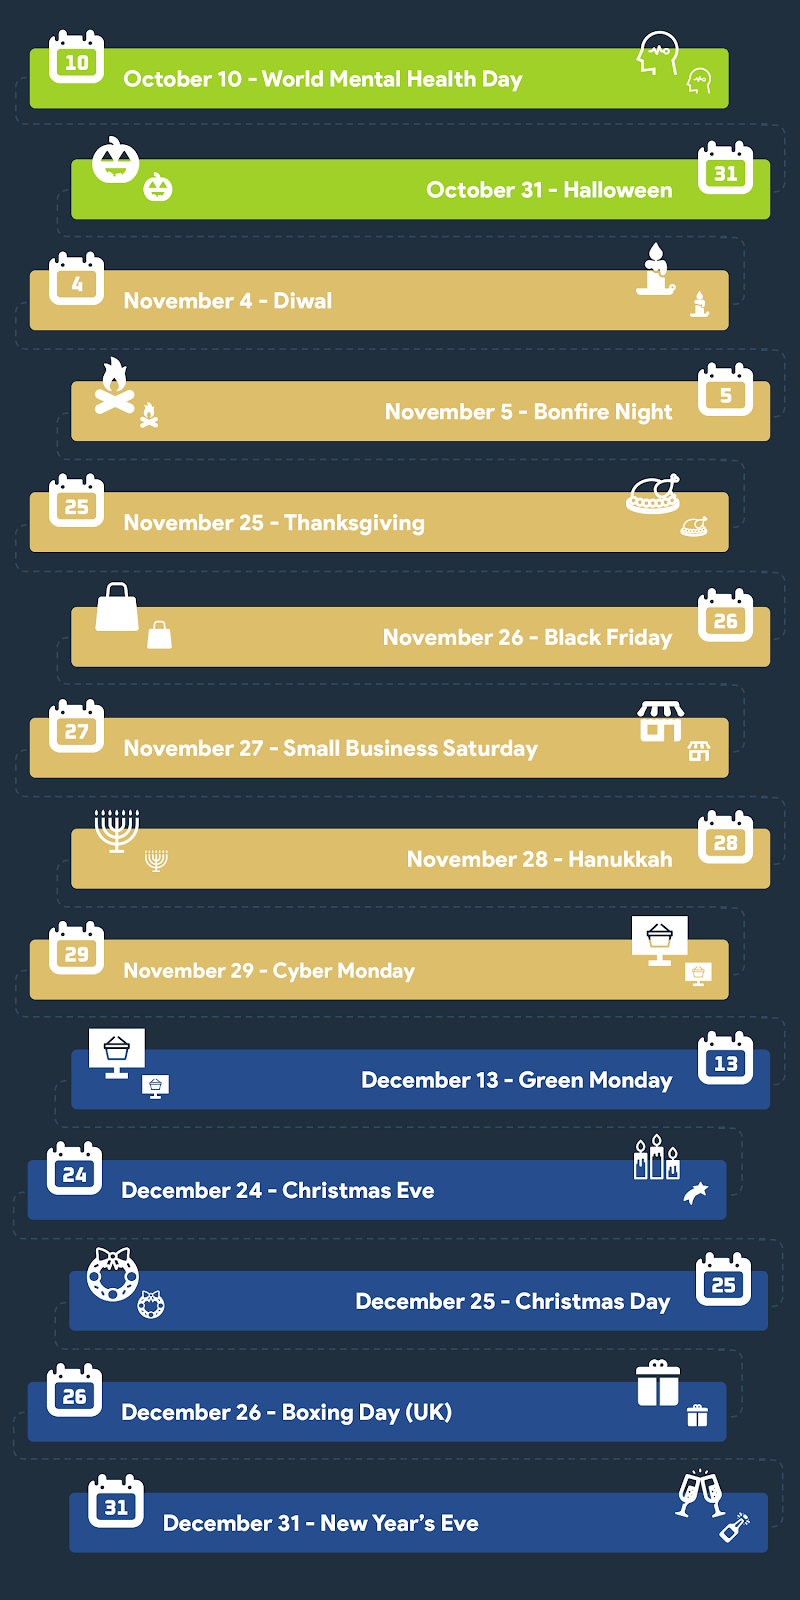 Key dates in 2021 - Affiliate marketing calendar(3)(Q4: OCTOBER - DECEMBER)